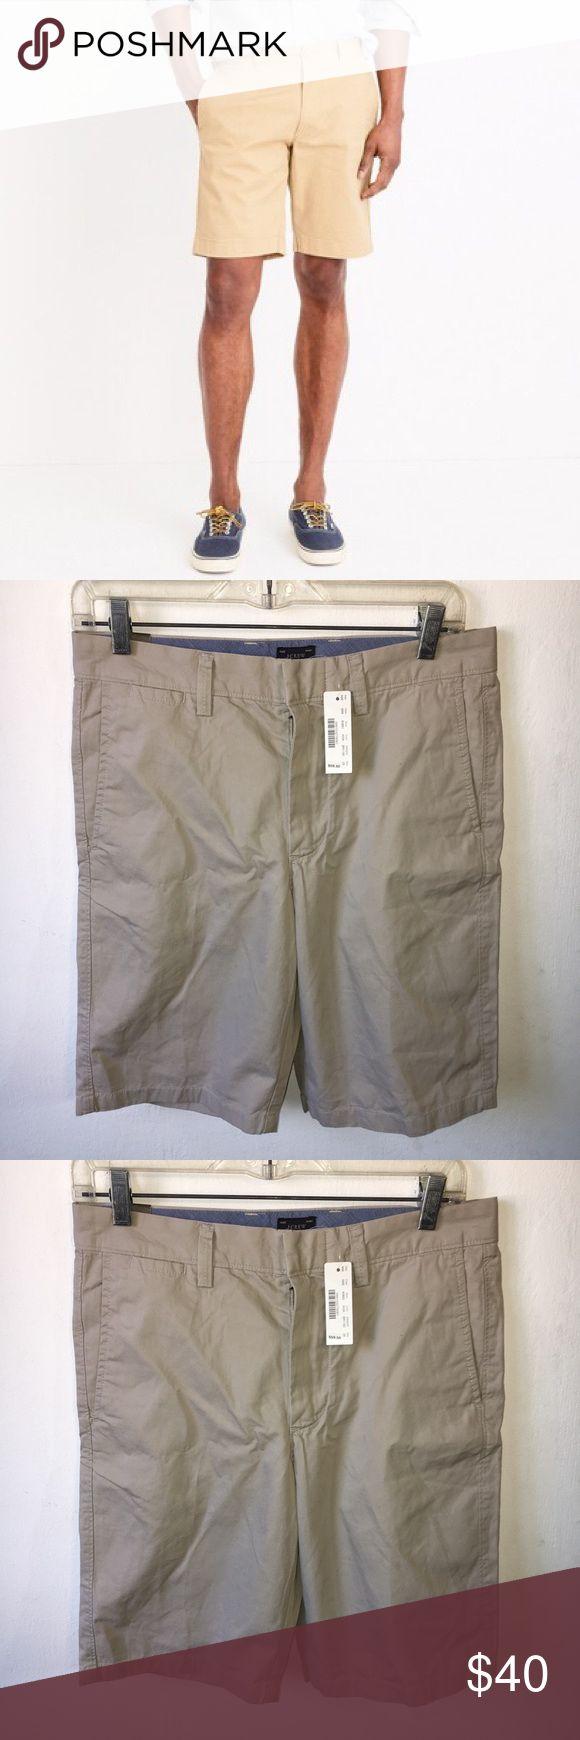 Jcrew men's Khaki Shorts Size 29 Jcrew men's Khaki Shorts Size 29 , brand new with tags. Retail $60 J. Crew Shorts